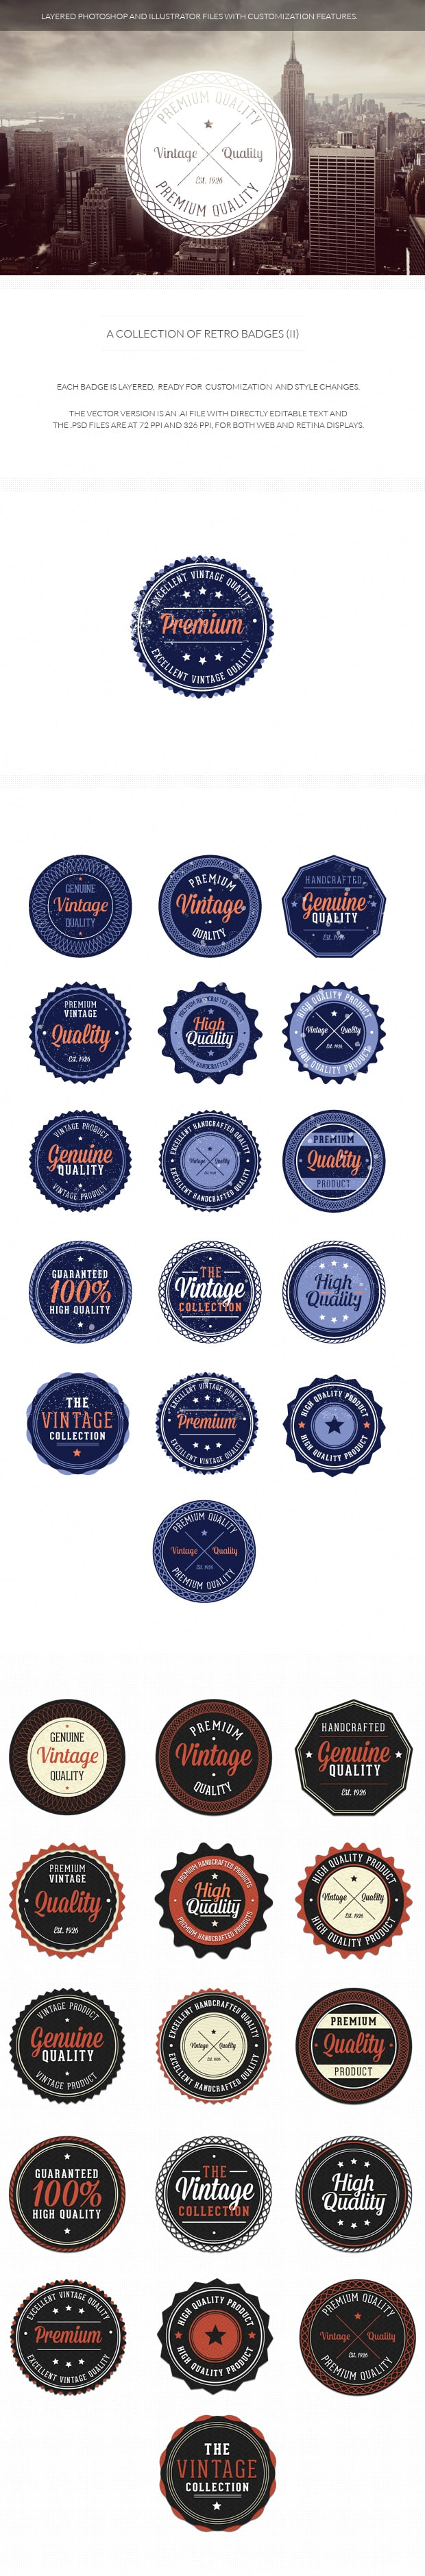 Retro badges set 2 retro 2